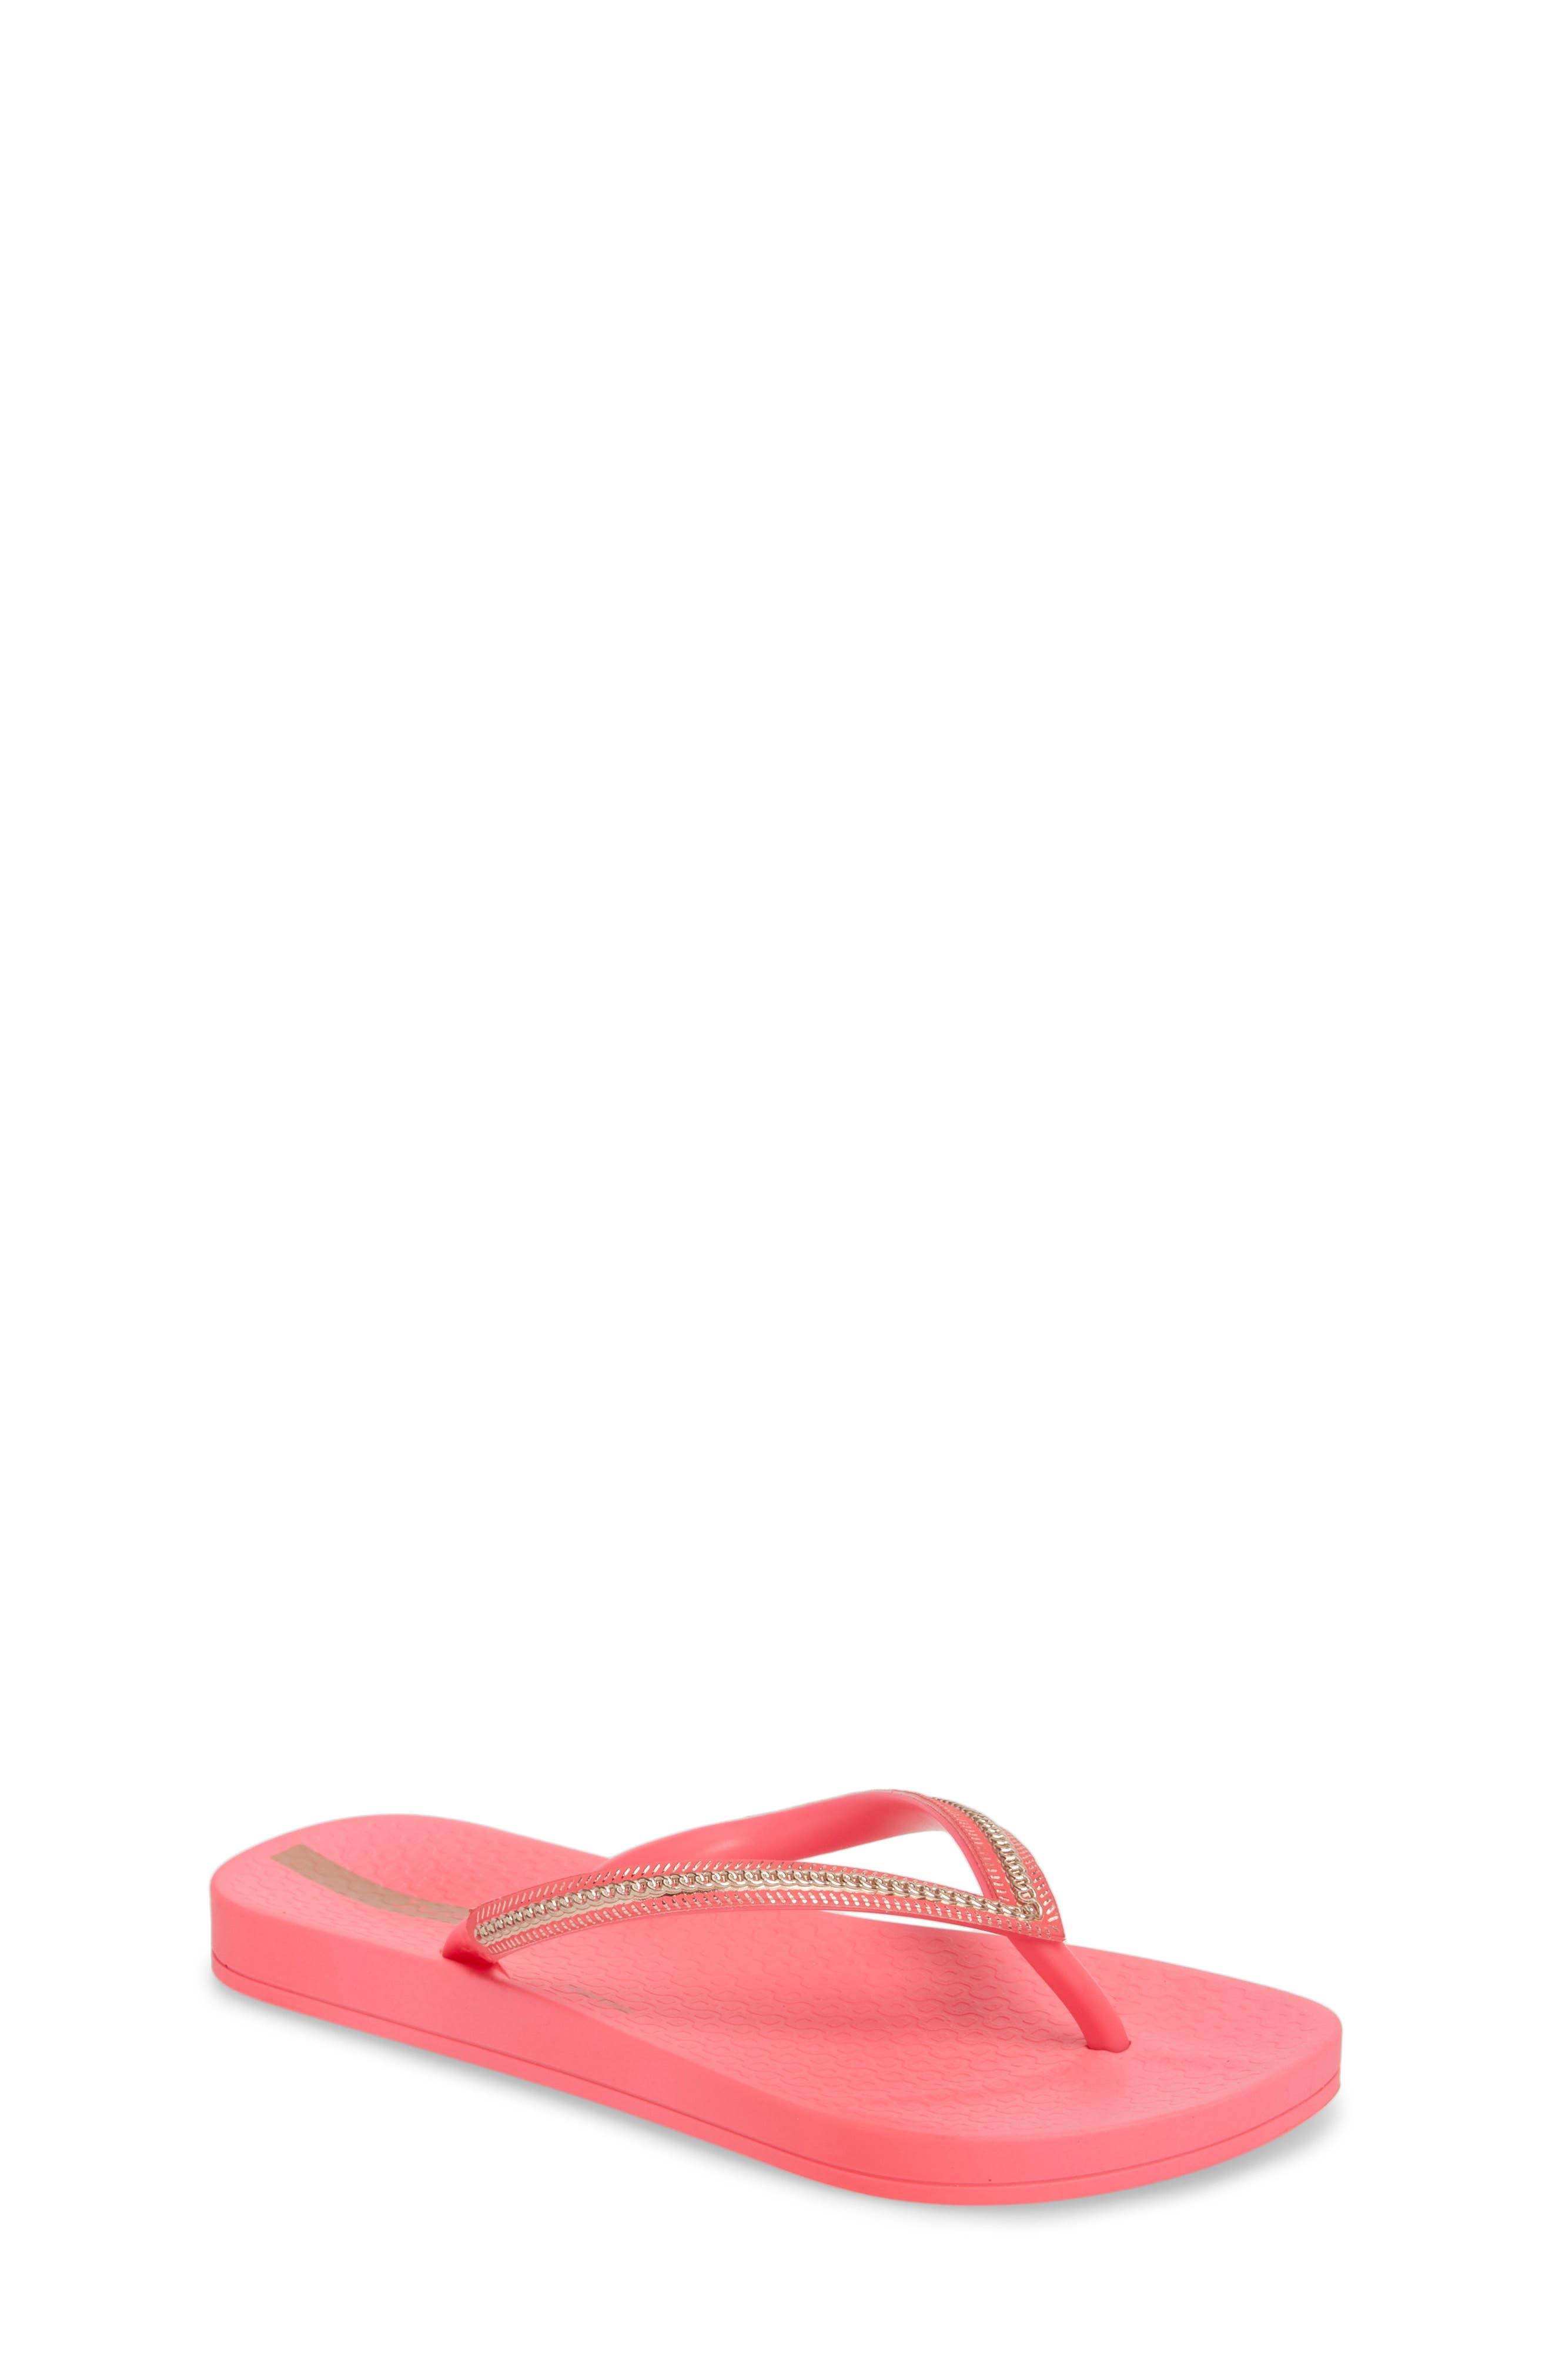 Ana Metallic Flip Flop,                             Main thumbnail 1, color,                             Pink Neon/ Rose